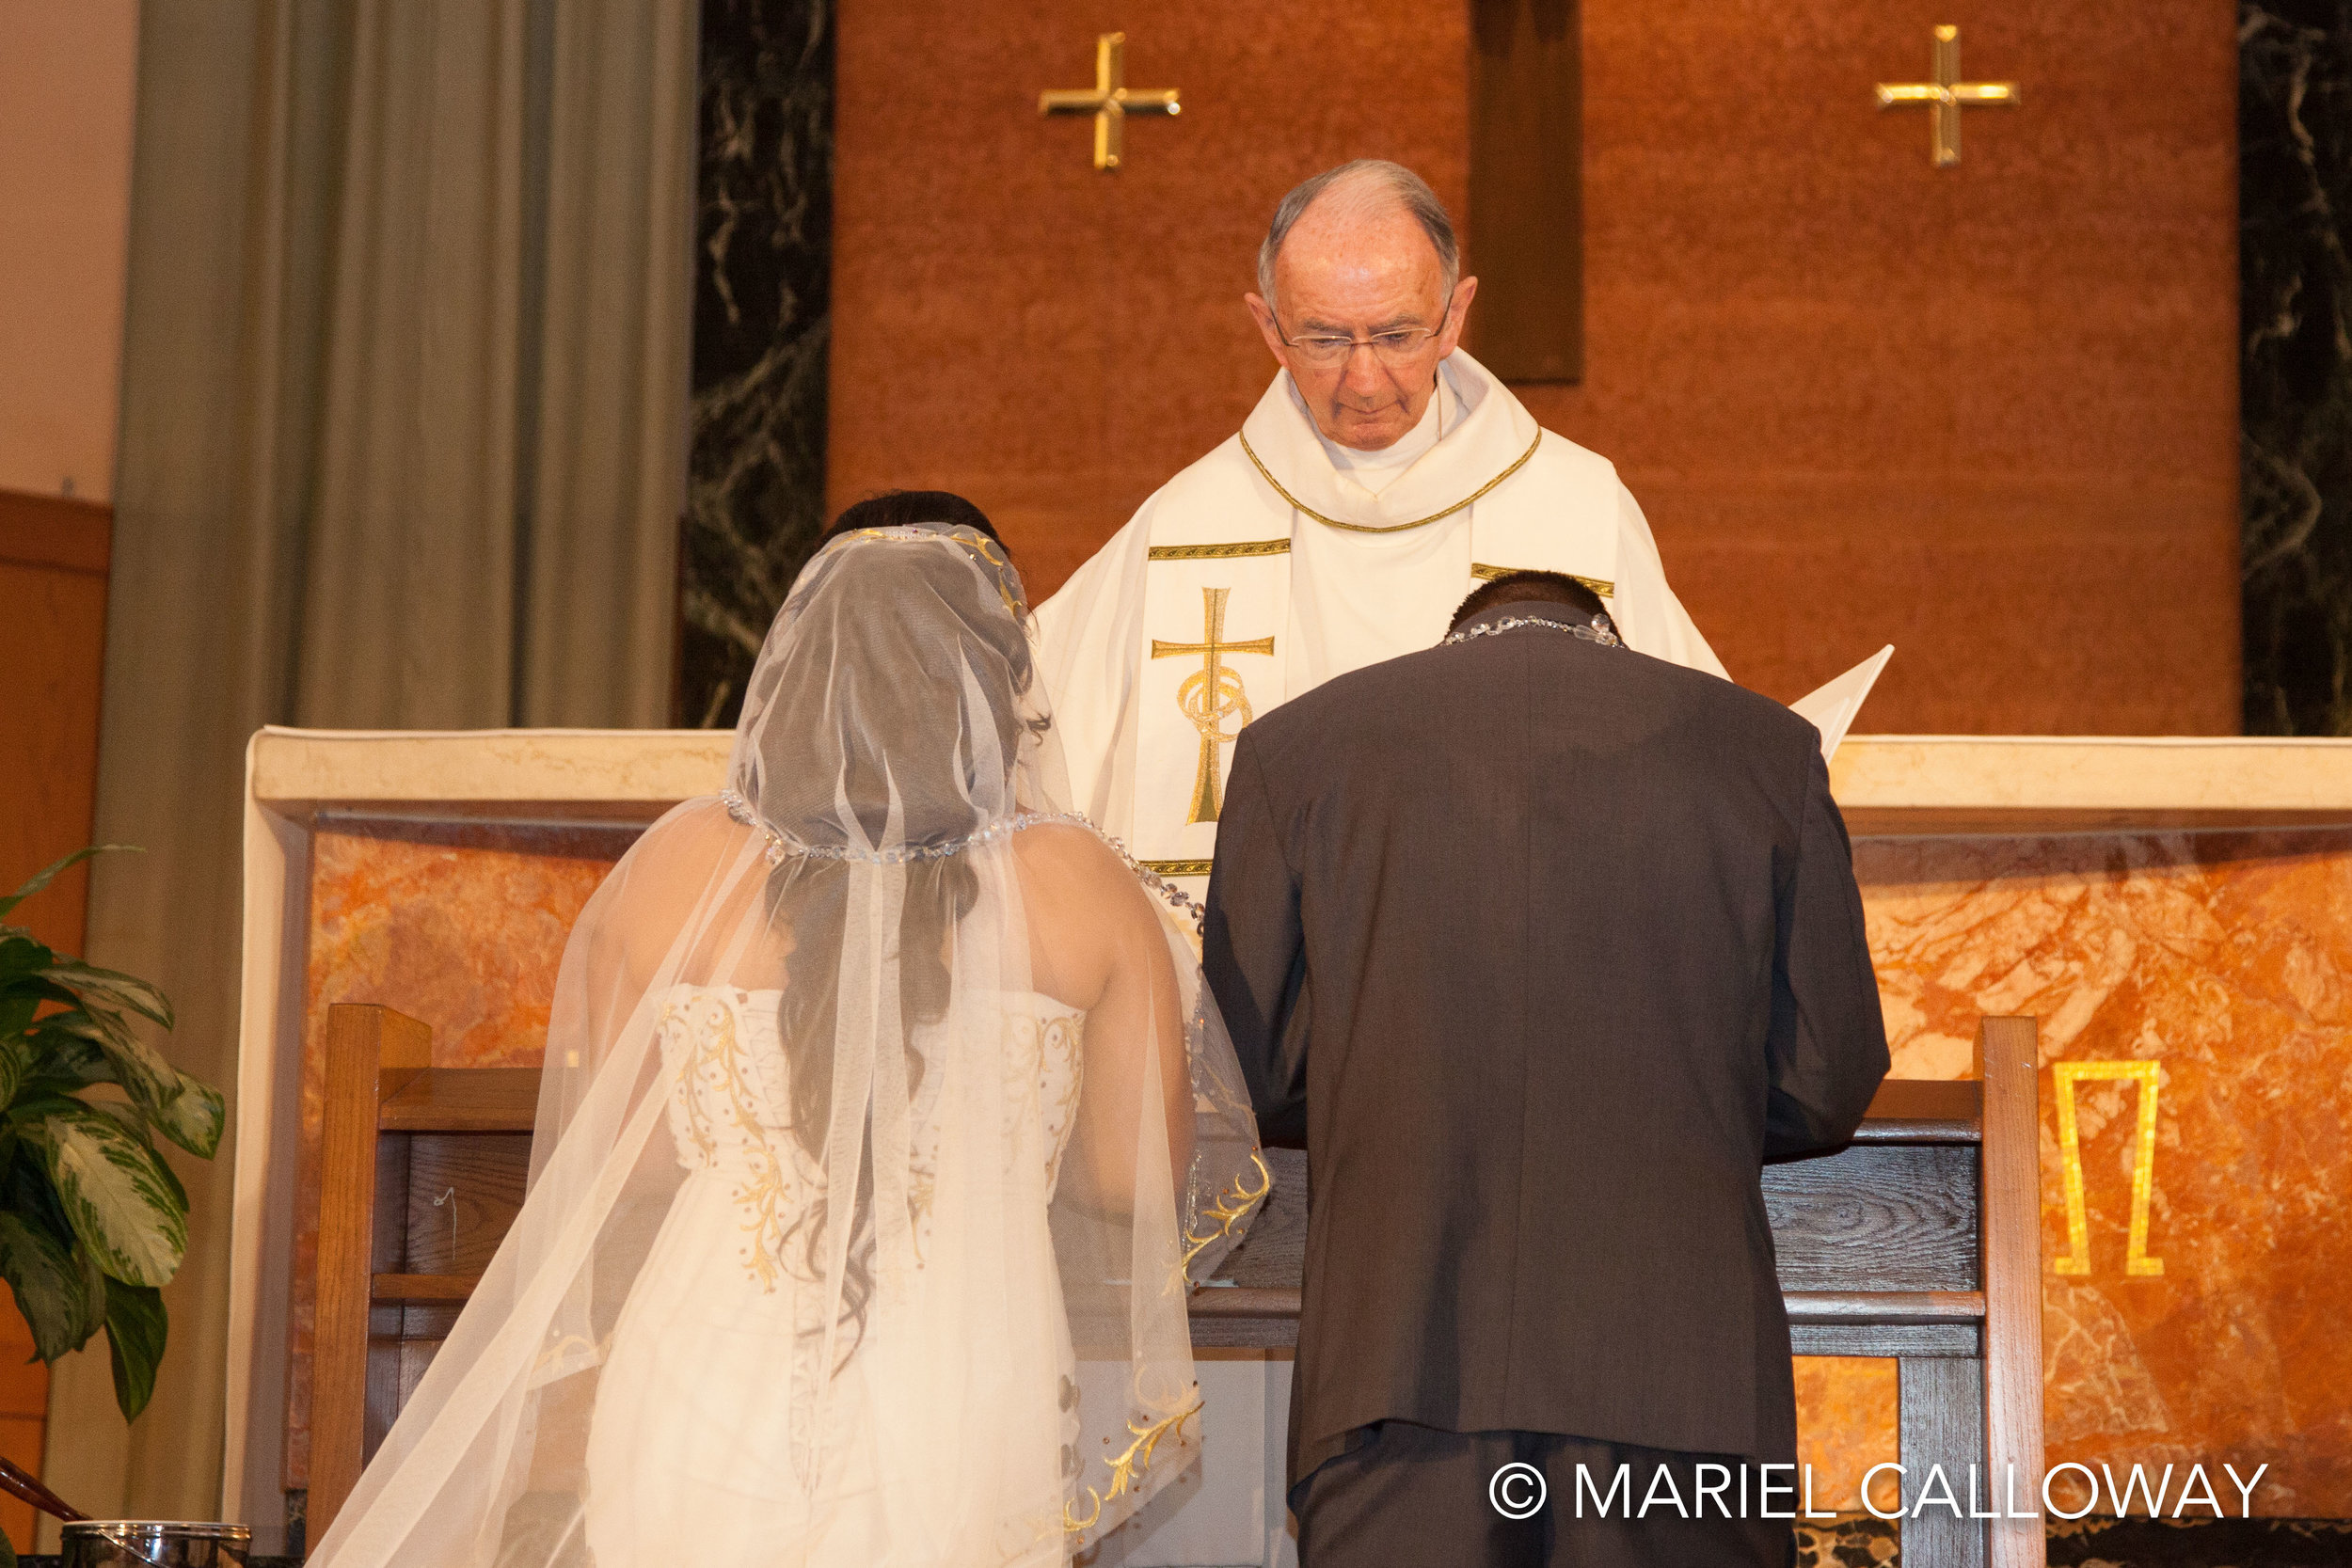 Mariel-Calloway-Los-Angeles-Wedding-Photography-Rossi-49.jpg